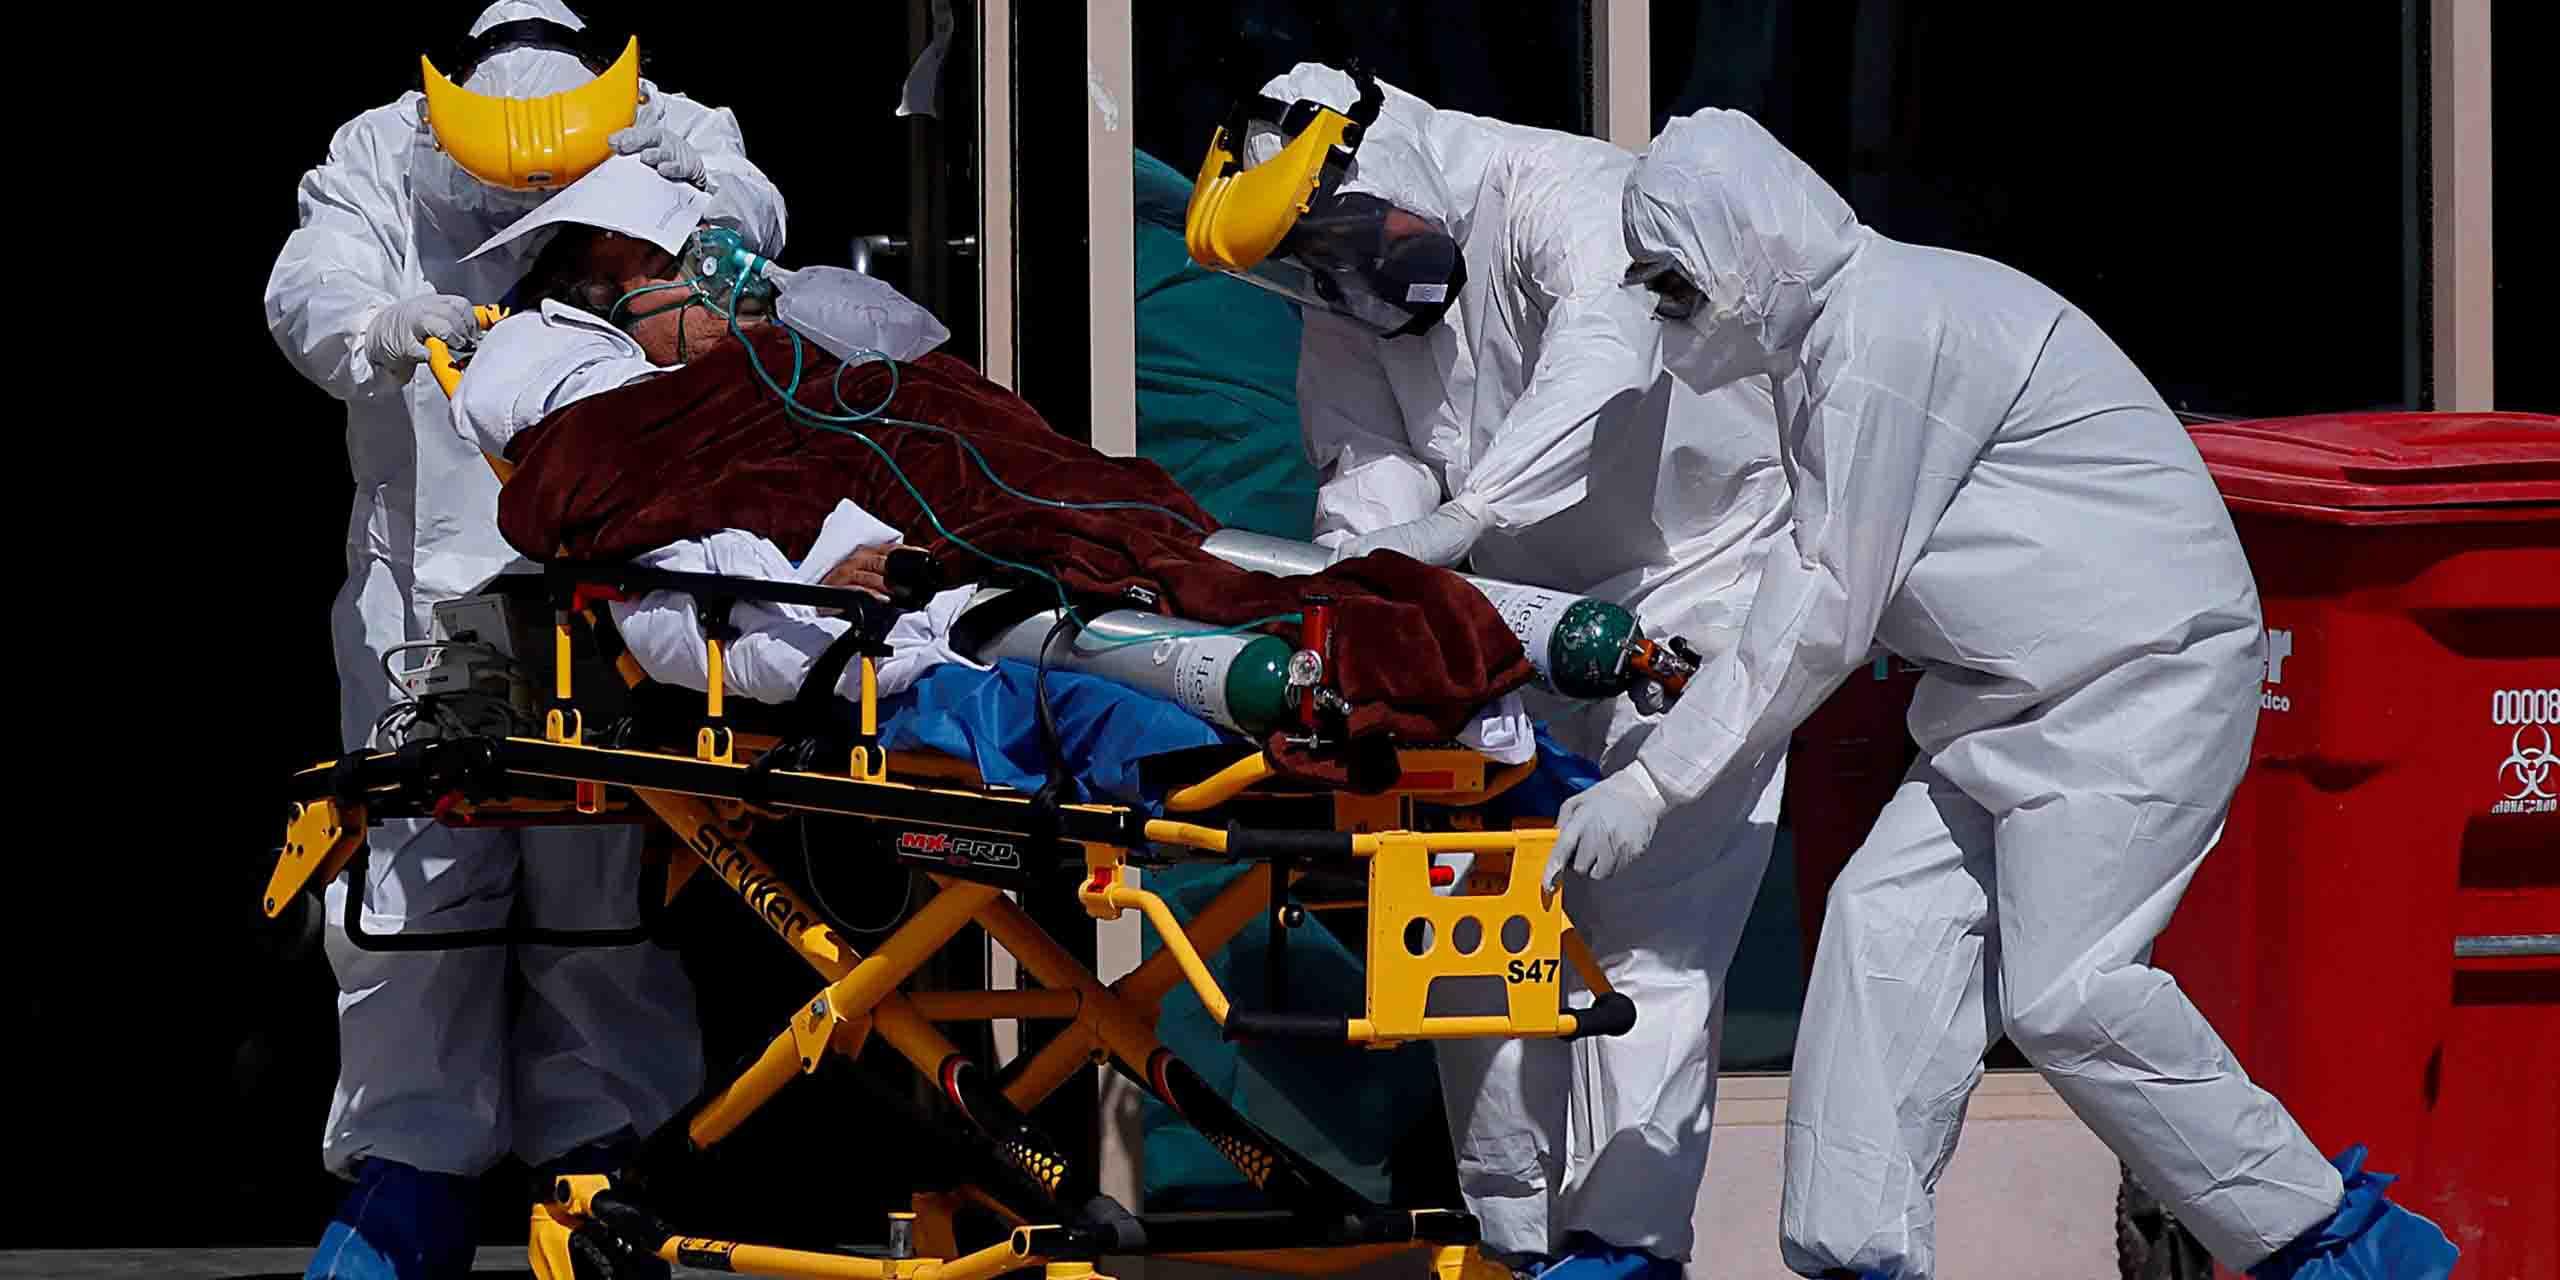 México acumula 232 mil 521 muertes por Covid | El Imparcial de Oaxaca